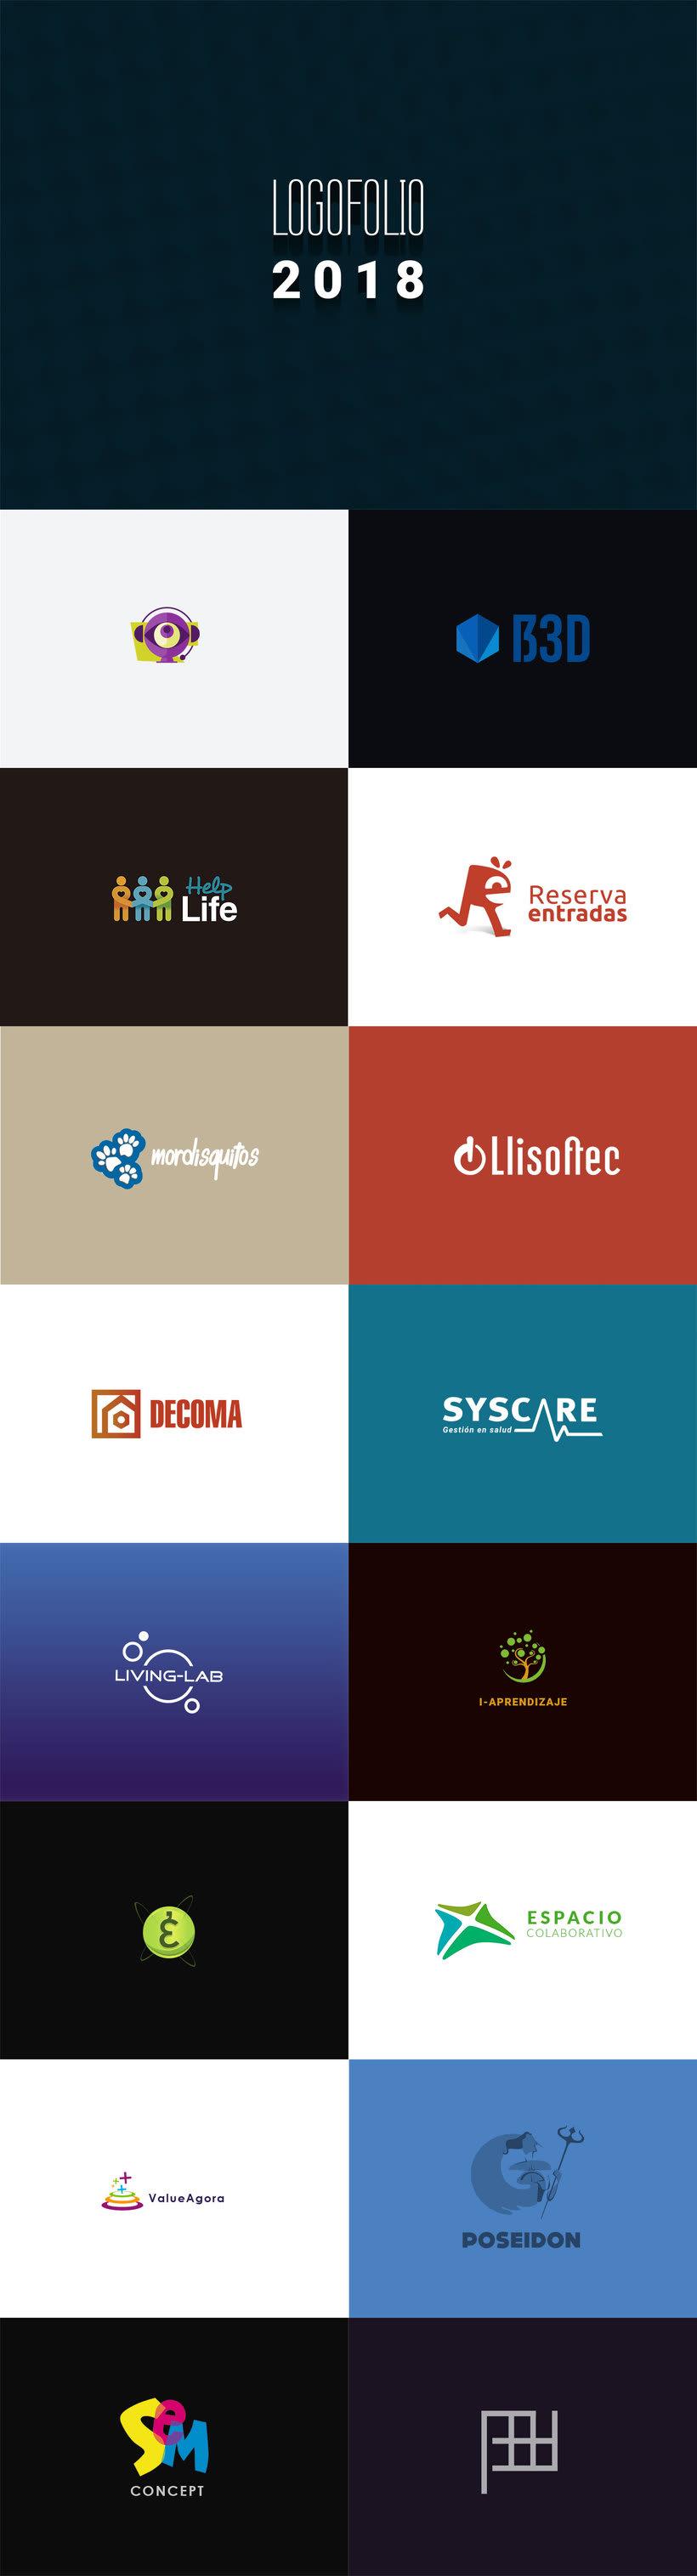 Logofolio 2018 0